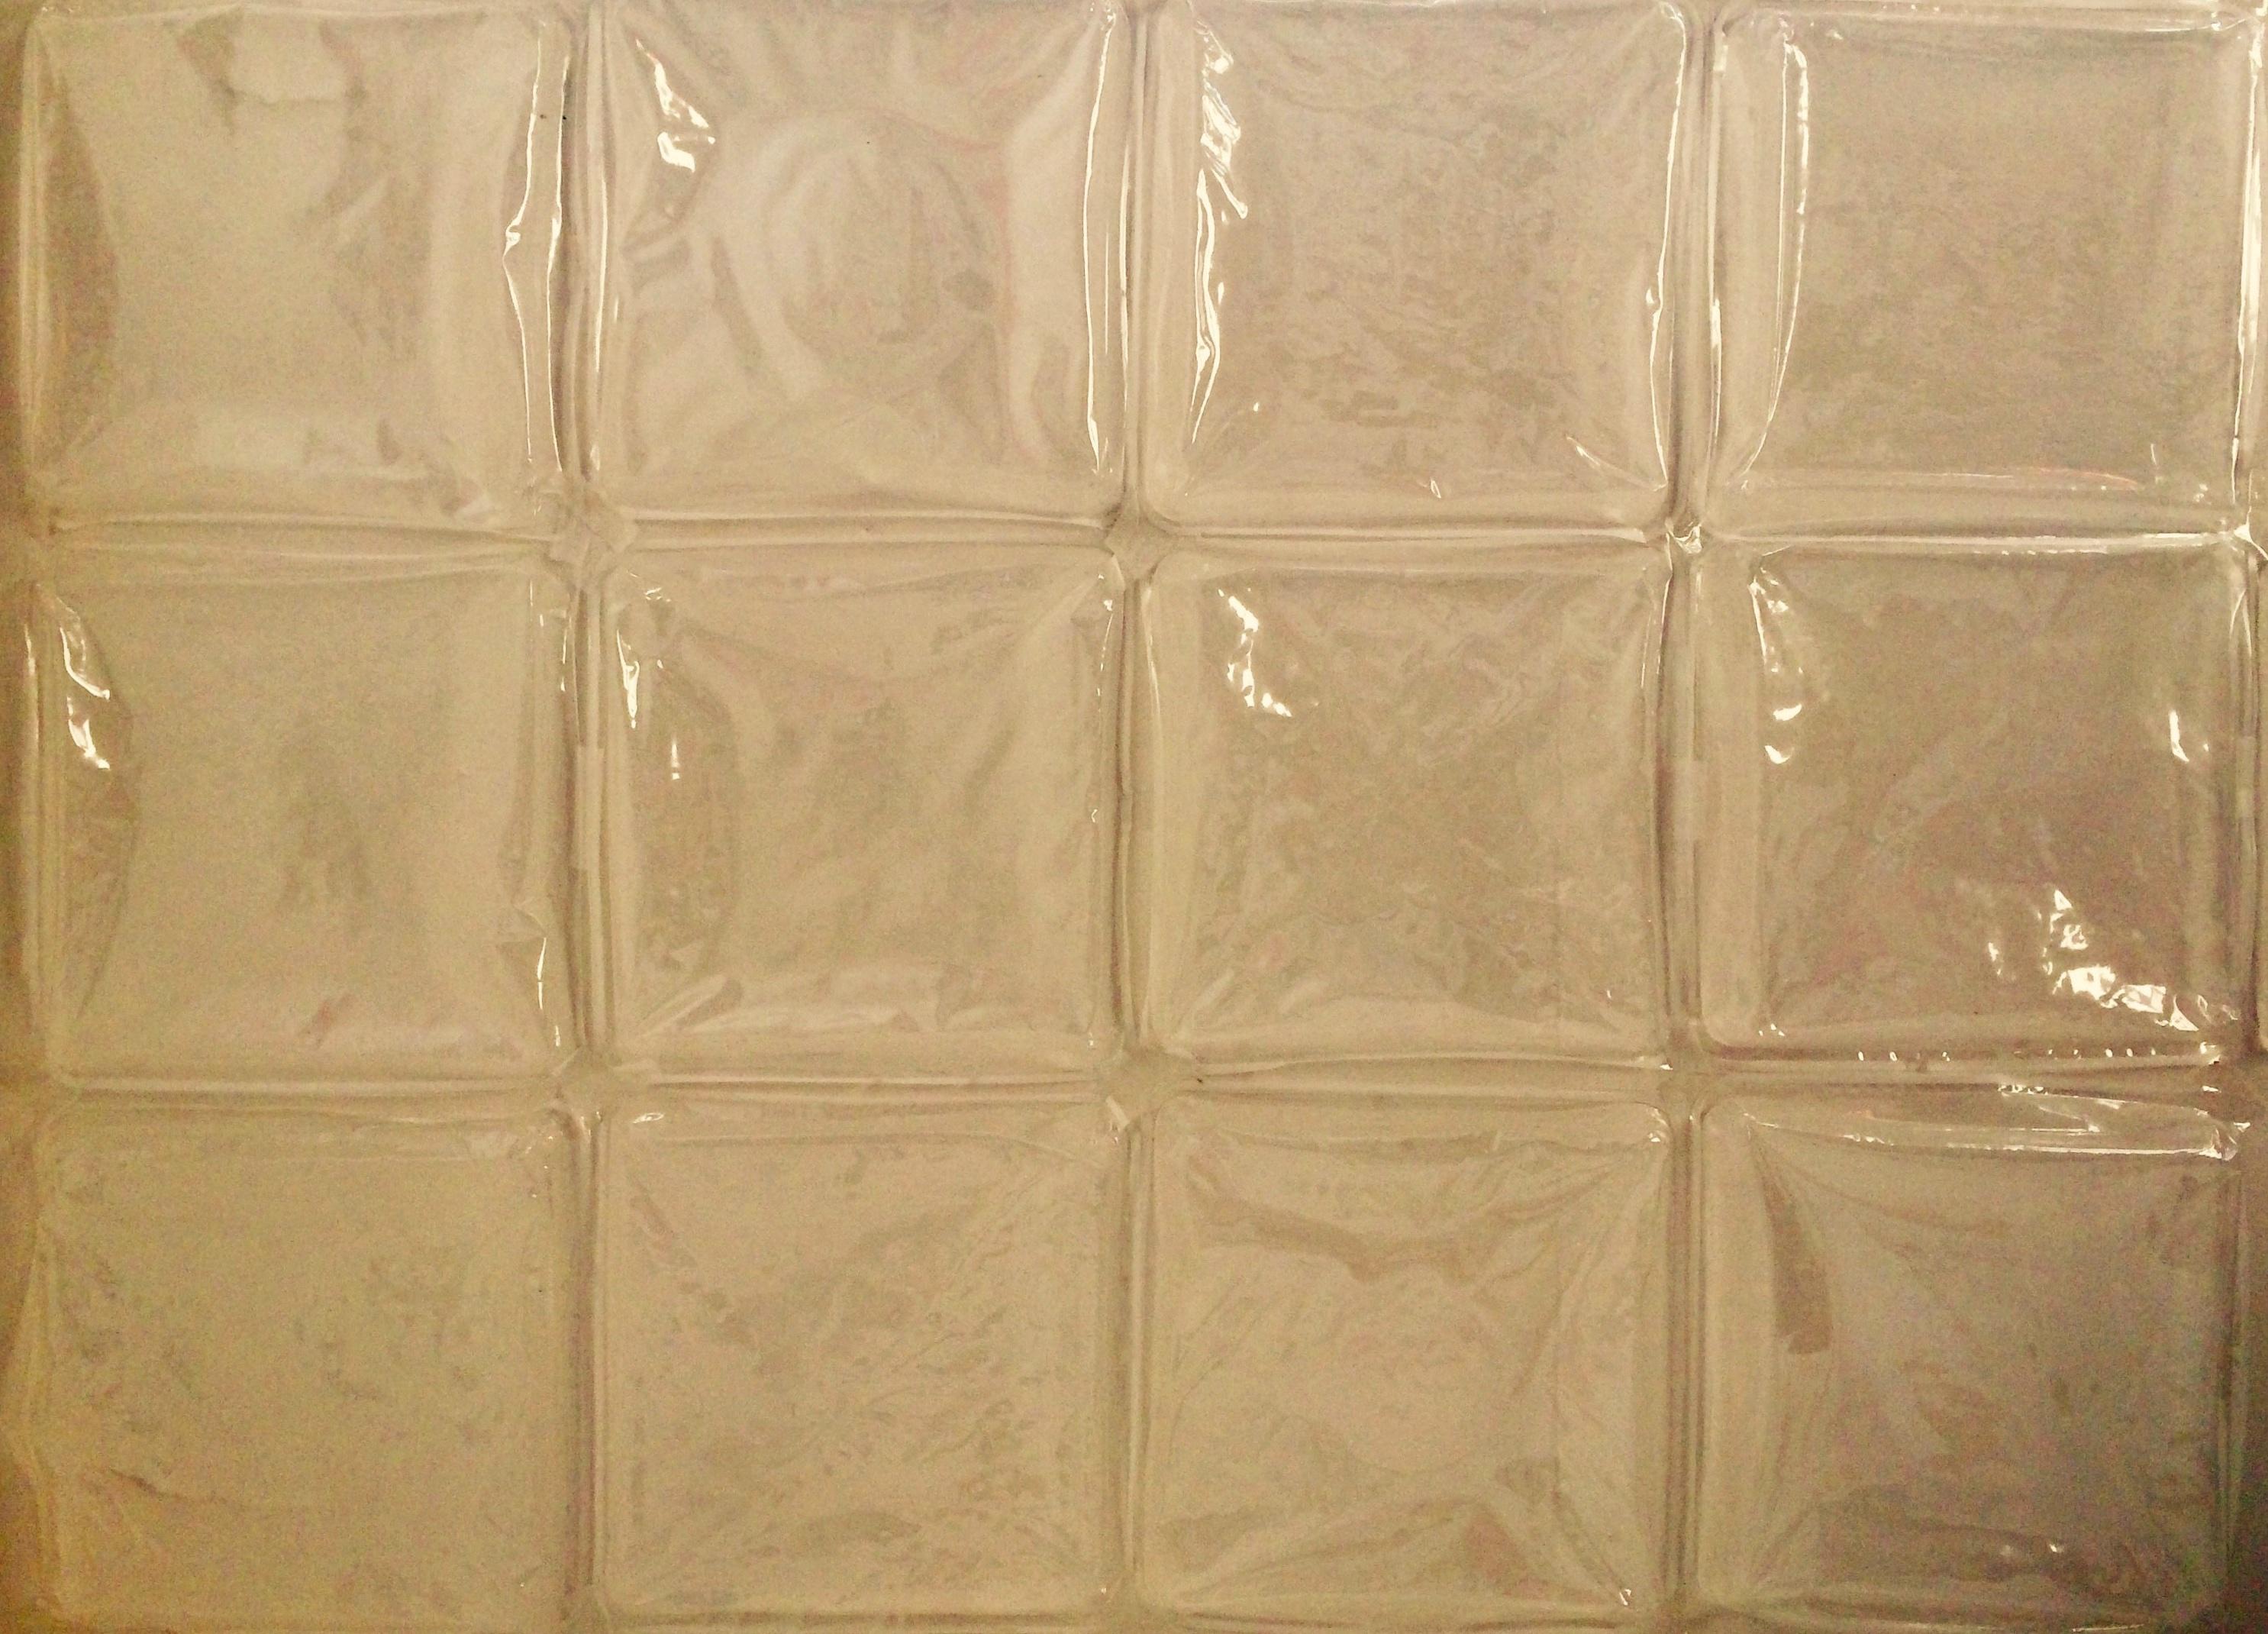 Plastic Grid 15 (work in progress)